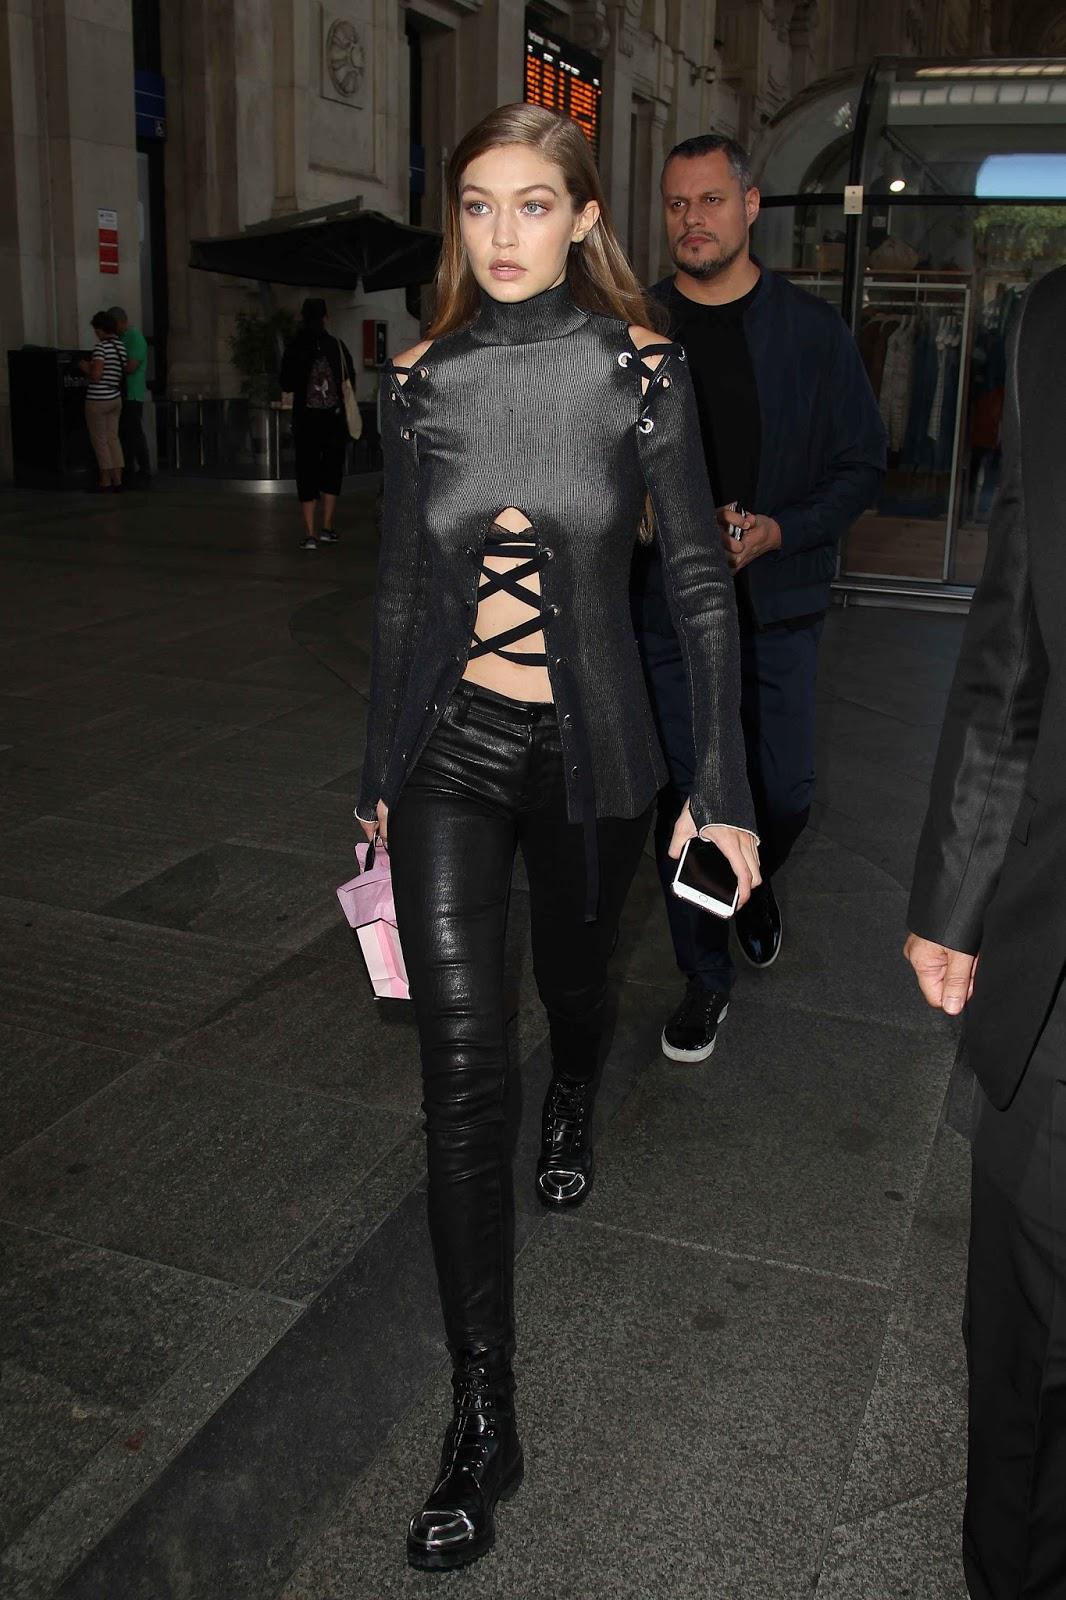 Gigi Hadid Walkign Out in Milan